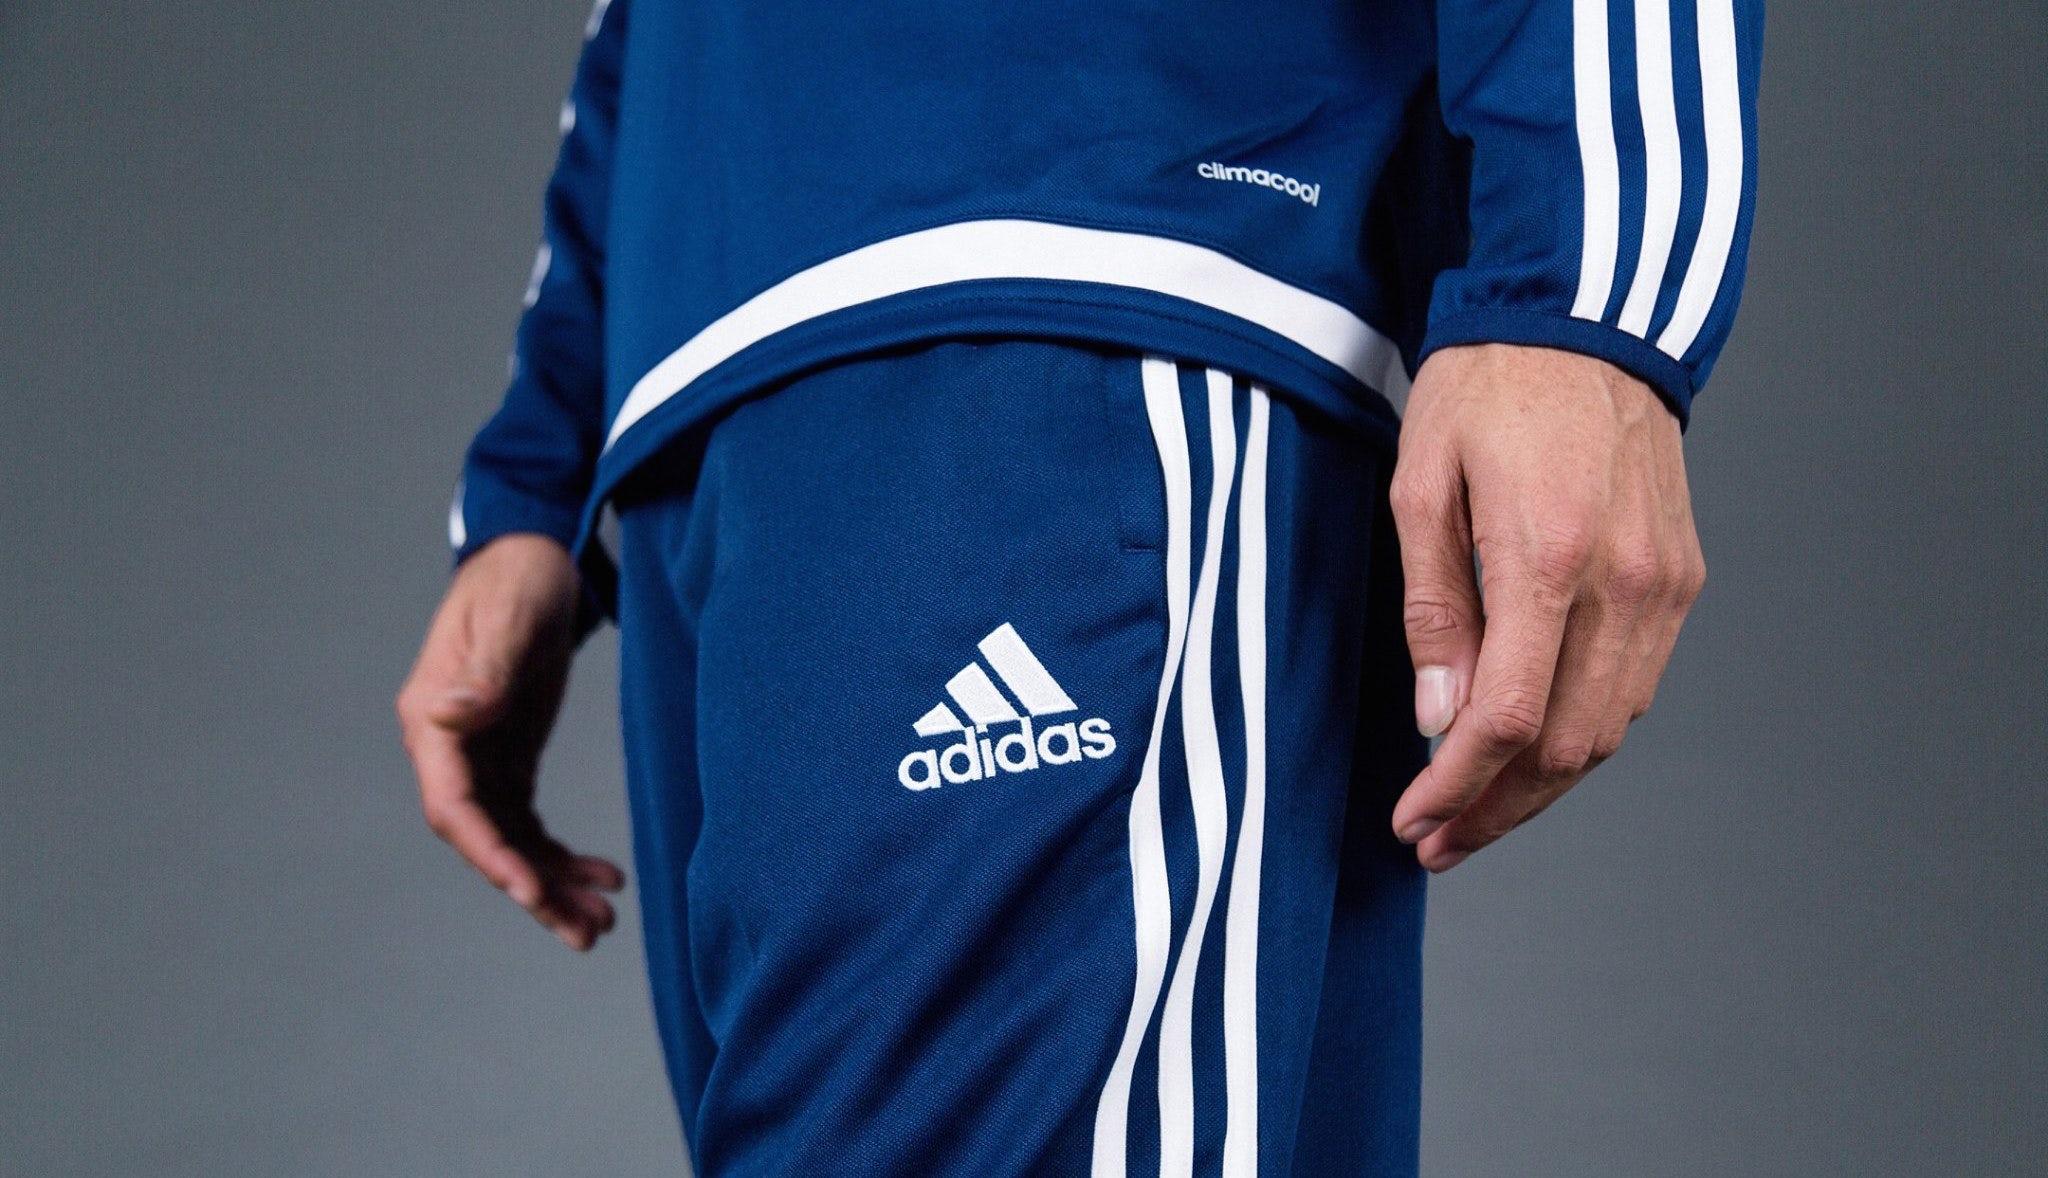 Adidas Beats Nike in European Soccer's Shirt-Sponsorship Race